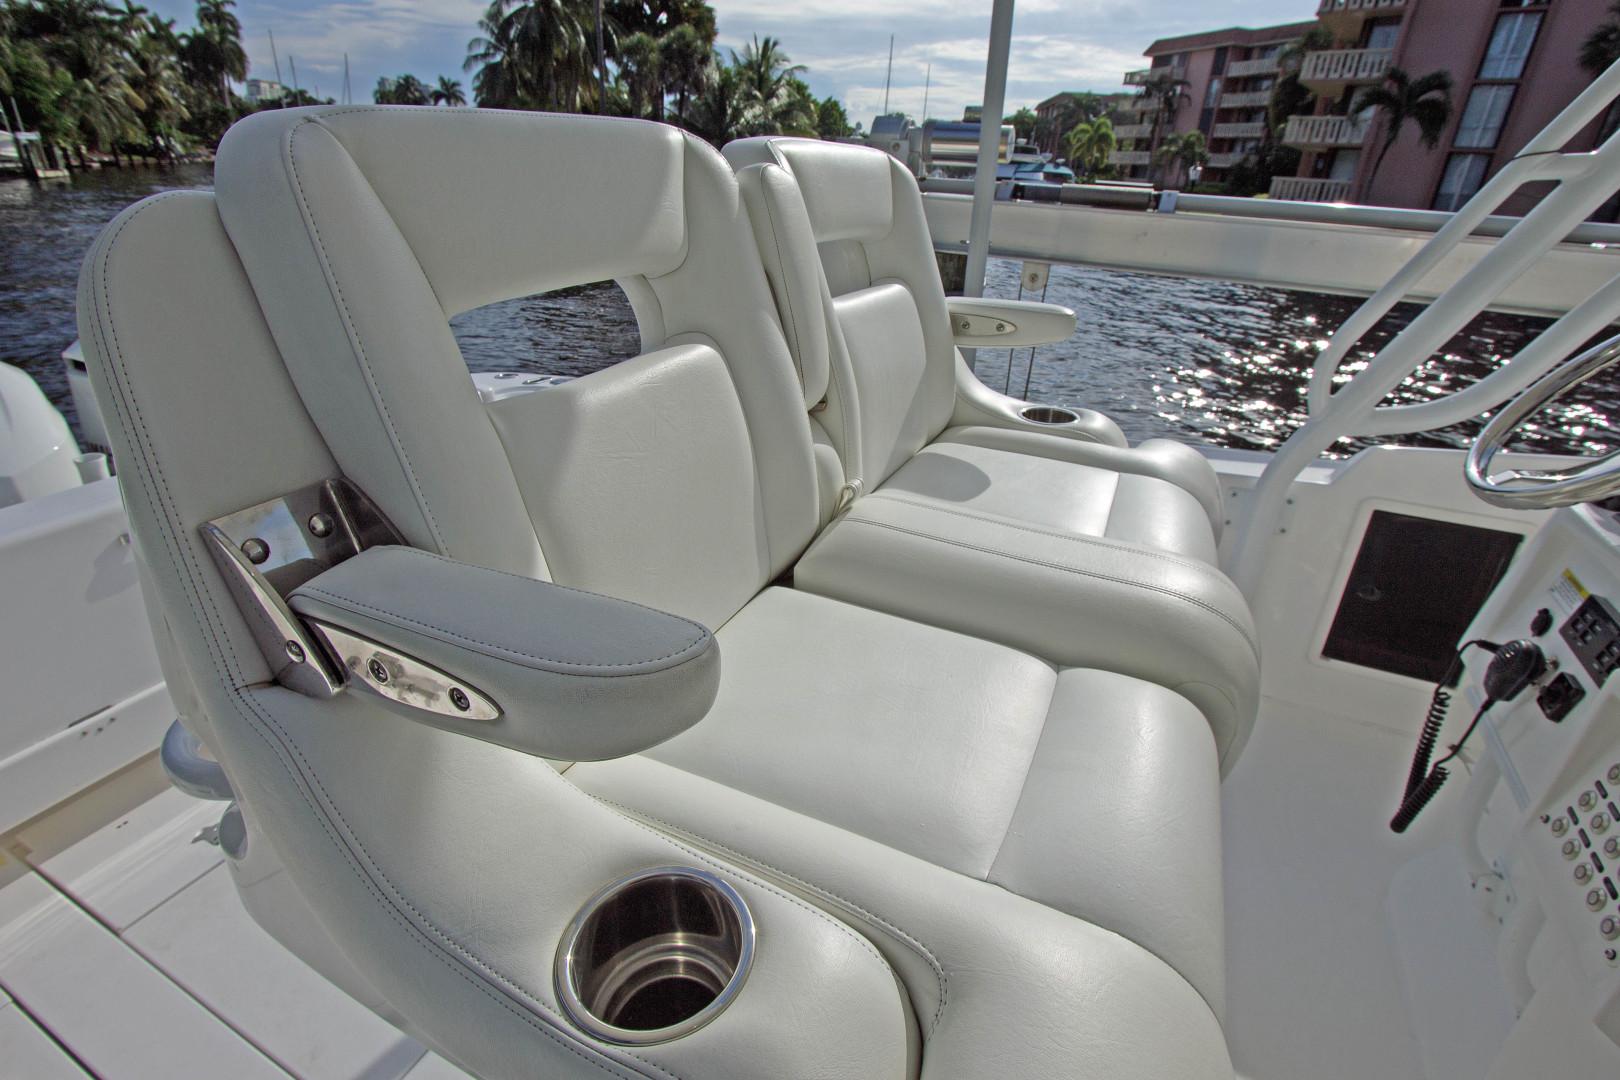 Intrepid-375 Walkaround 2014-NN 375 Walkaround 2014 Fort Lauderdale-Florida-United States-1507852 | Thumbnail